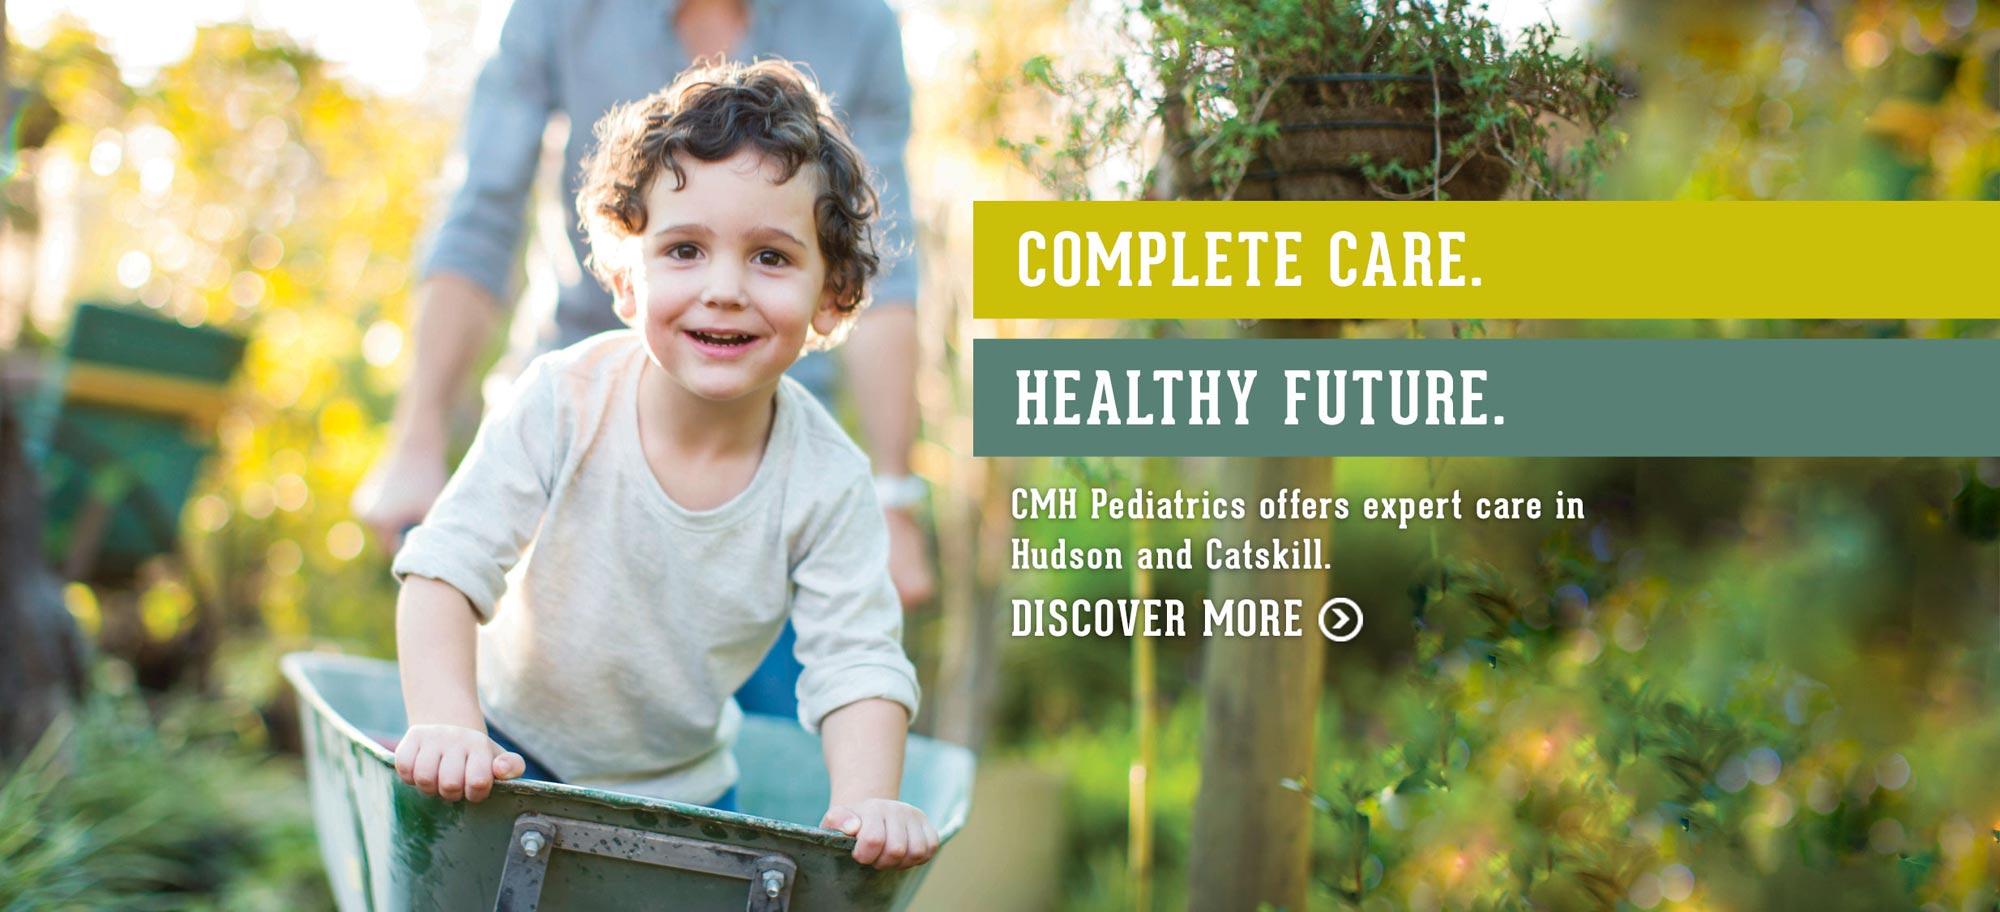 Home - Columbia Memorial Health